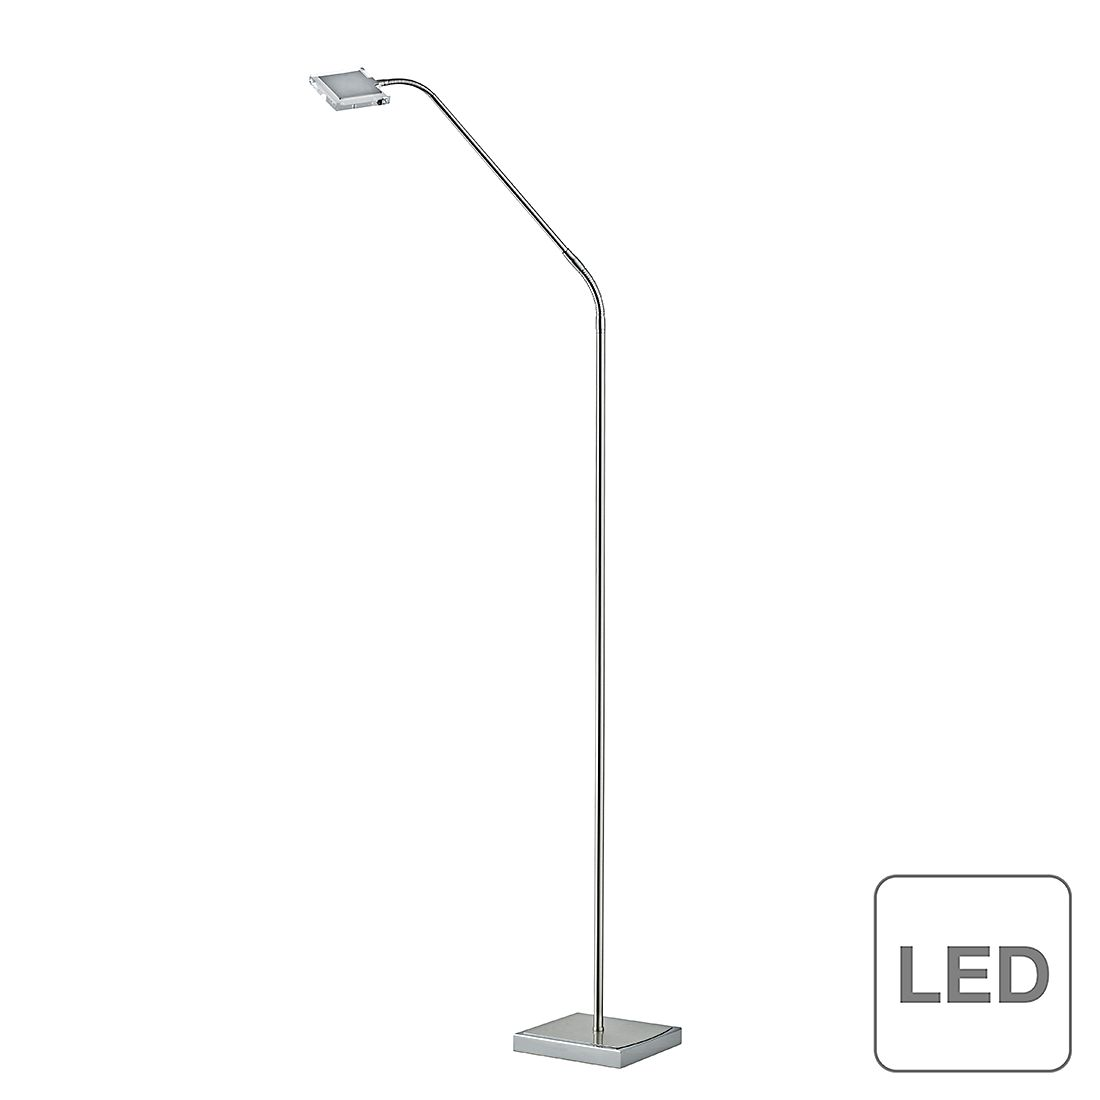 EEK A+, Lampadaire Daan - 18 ampoules, Paul Neuhaus